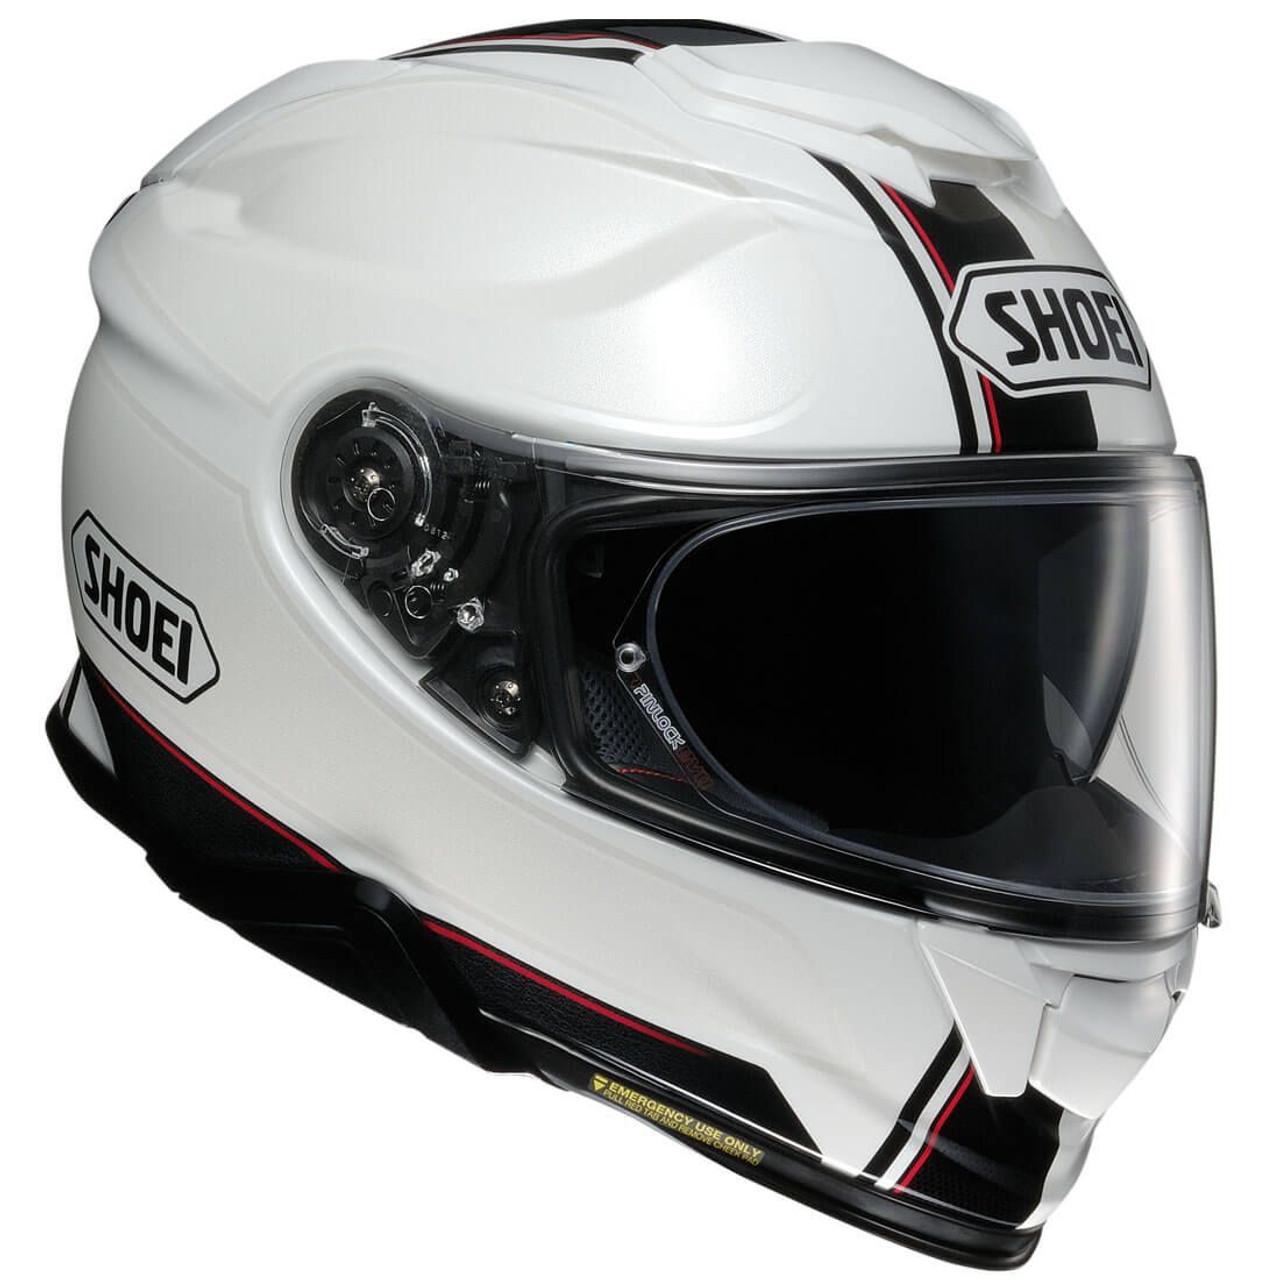 shoei gt air 2 motorcycle helmet redux white get lowered cycles. Black Bedroom Furniture Sets. Home Design Ideas